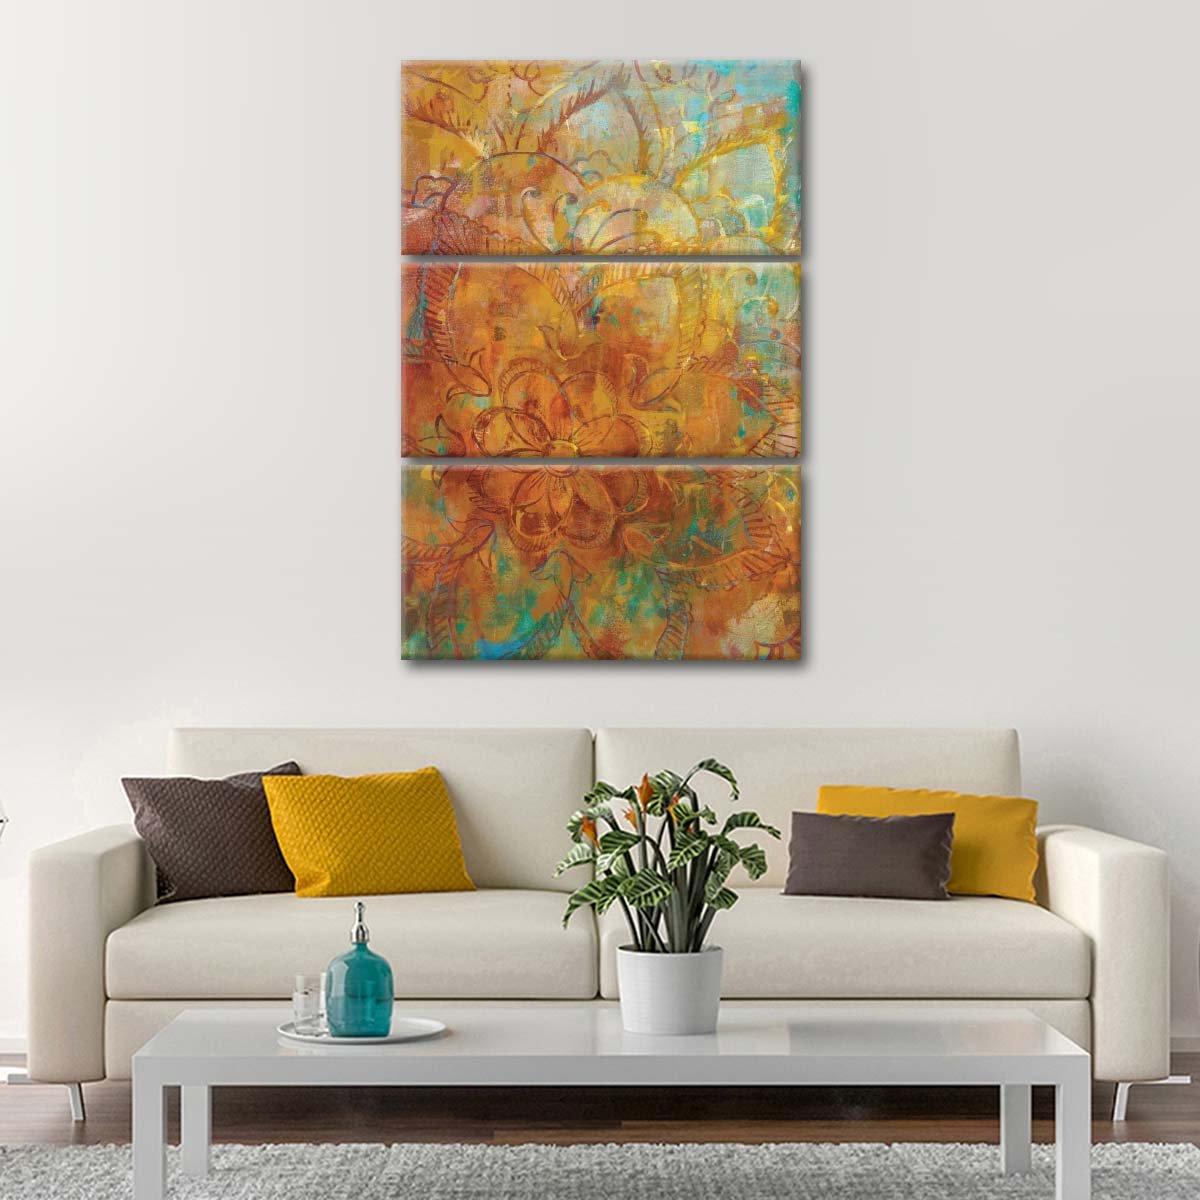 Bohemian Abstract Bright Multi Panel Canvas Wall Art